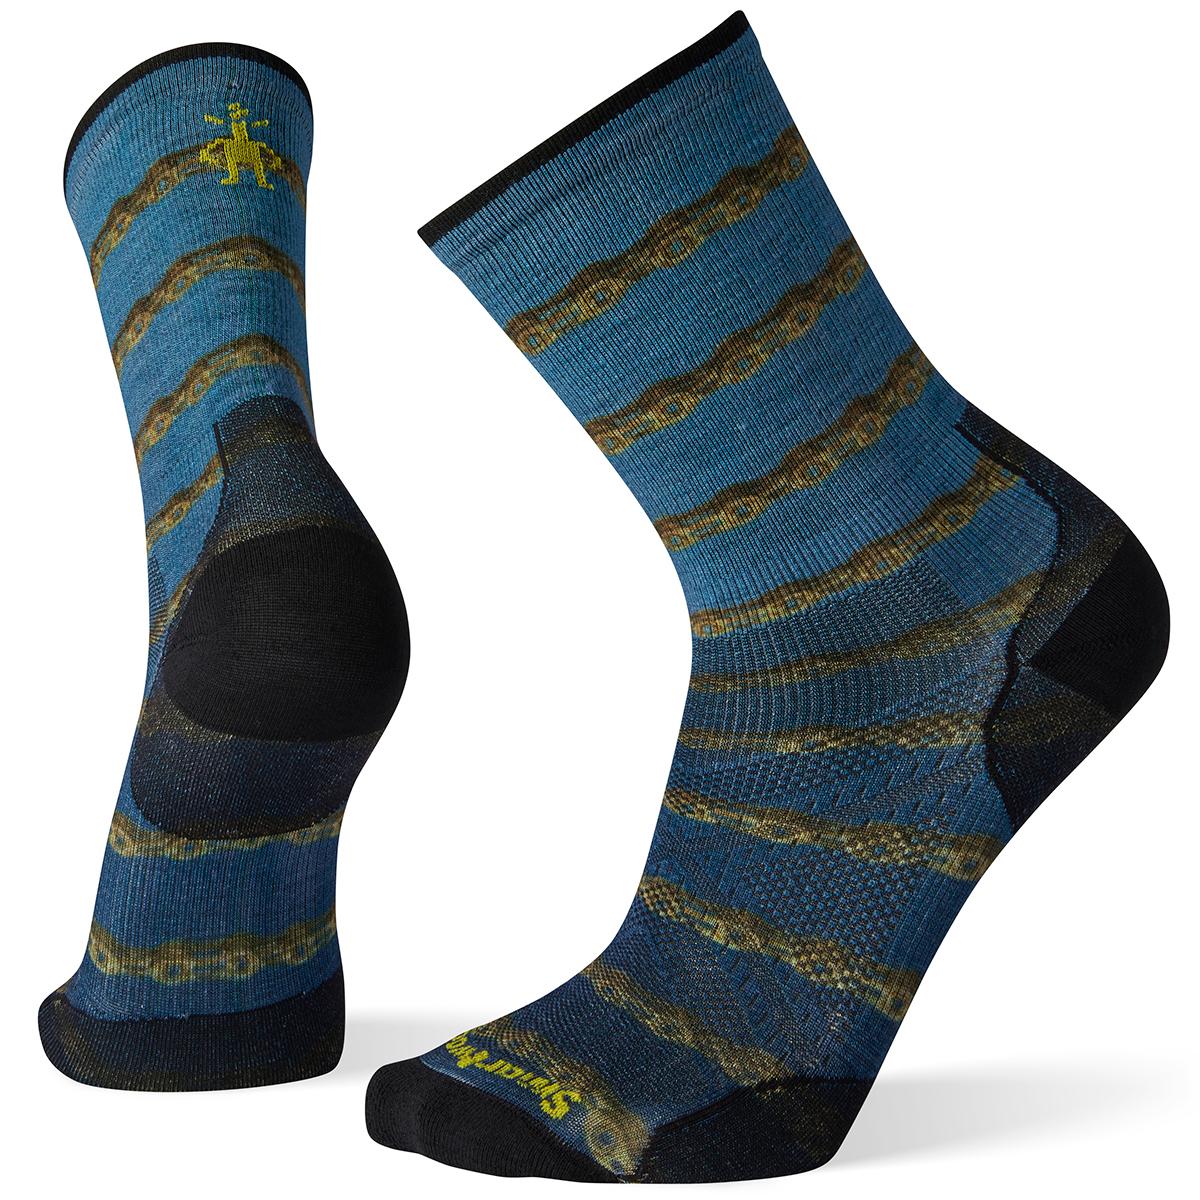 Smartwool Men's Phd Cycle Ultra Light Crew Socks - Black, XL